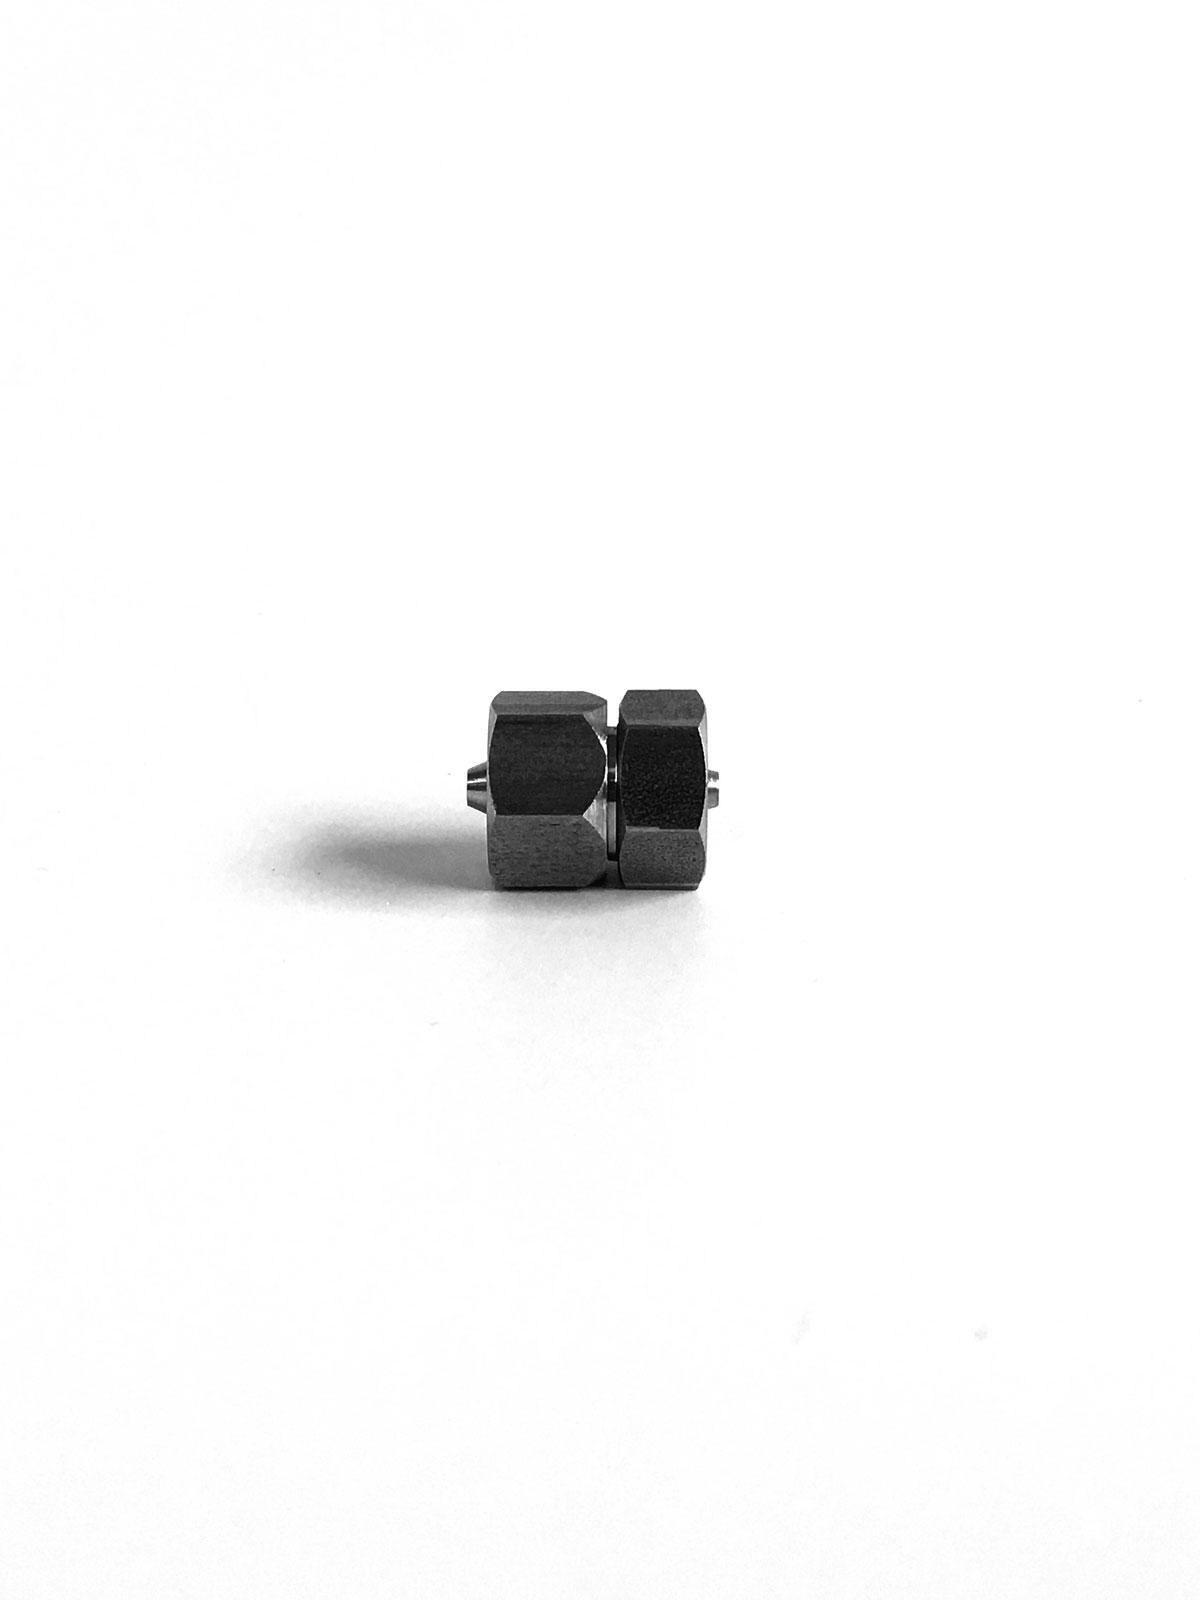 8dc7c725592 Válvula seguridad y descompresión para olla express OMEGA TITAN ...